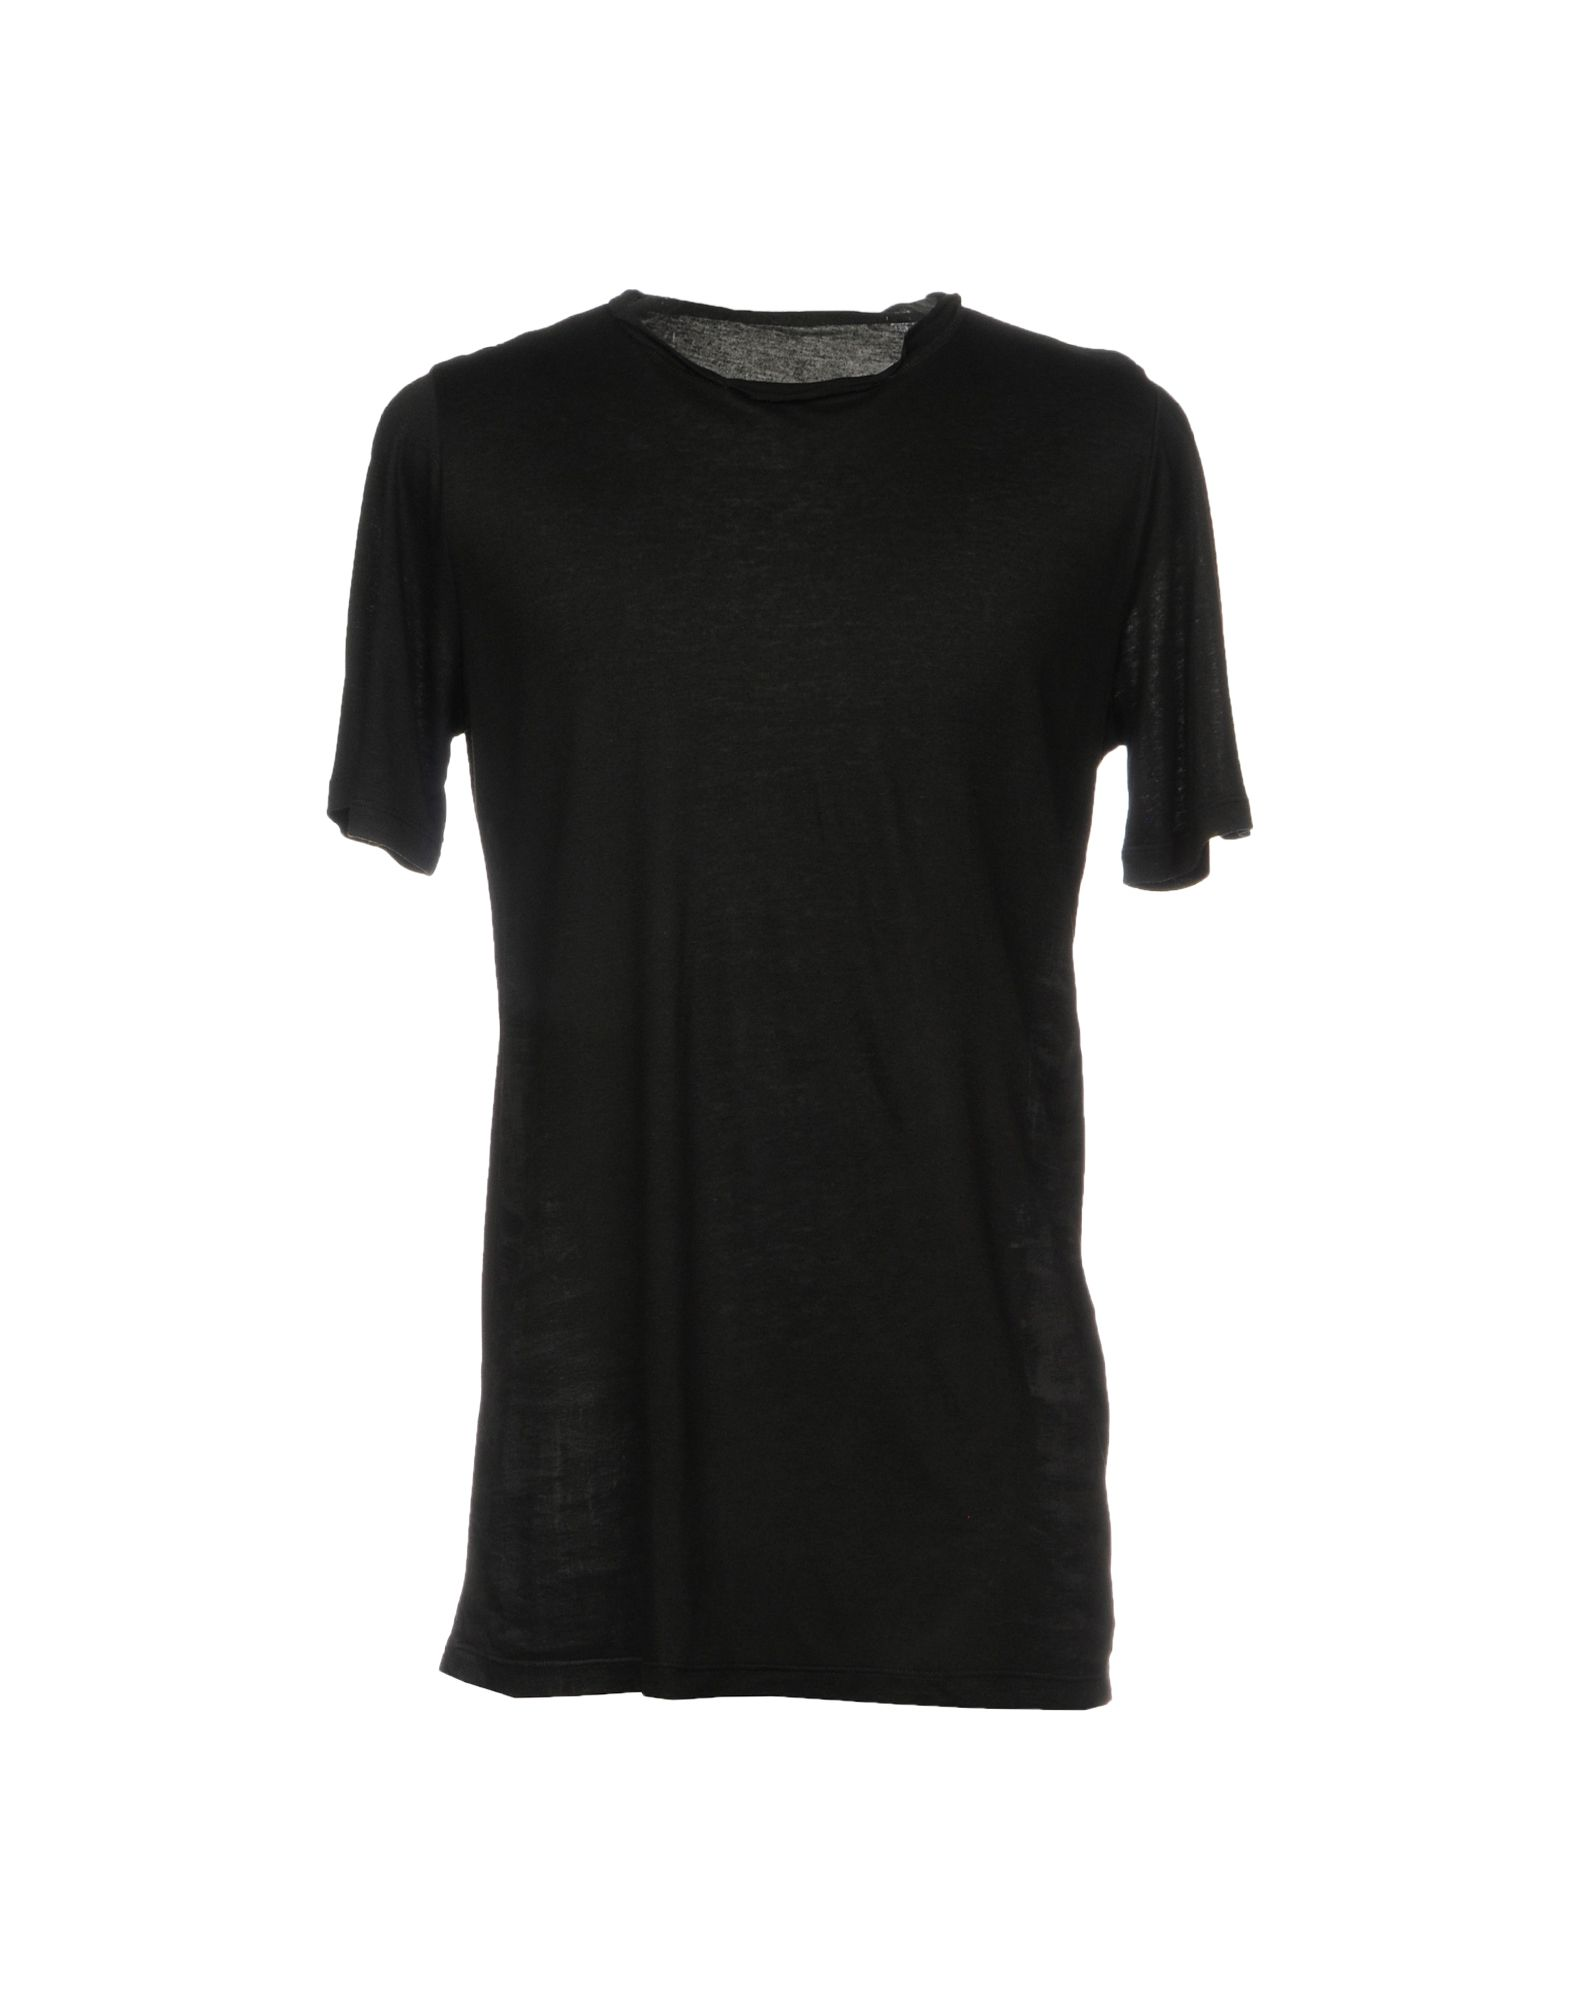 f592b4b2a A buon T-Shirt Manostorti - 12084720JK Uomo mercato onzkho3104 ...